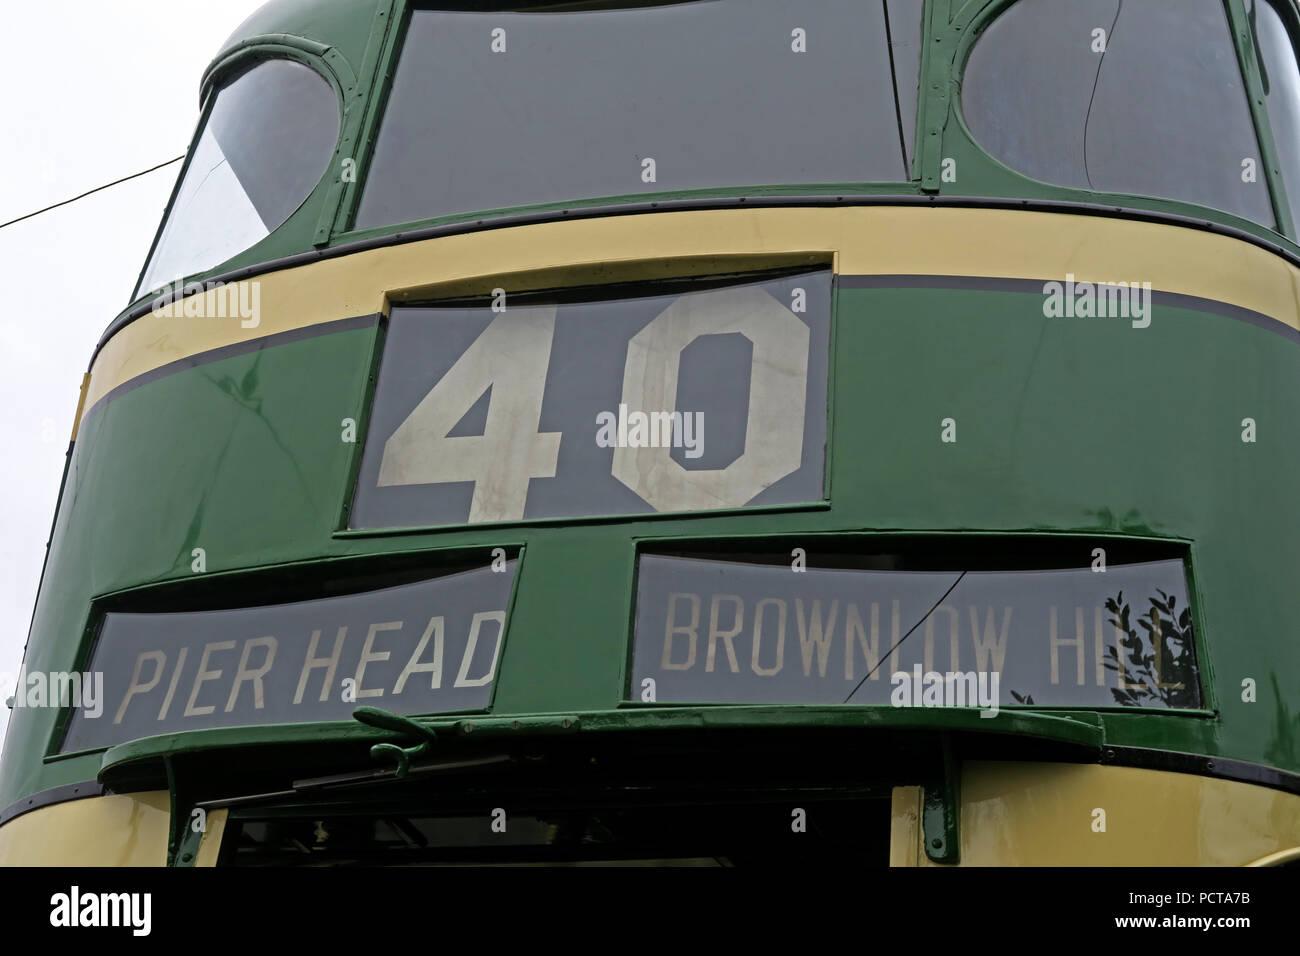 GoTonySmith,@HotpixUK,Transport,tram,trams,Birkenhead,green,cream,creme,north west England,UK,England,public,public trams,public tram,history,historic,electric,Pierhead,Brownlow hill,40